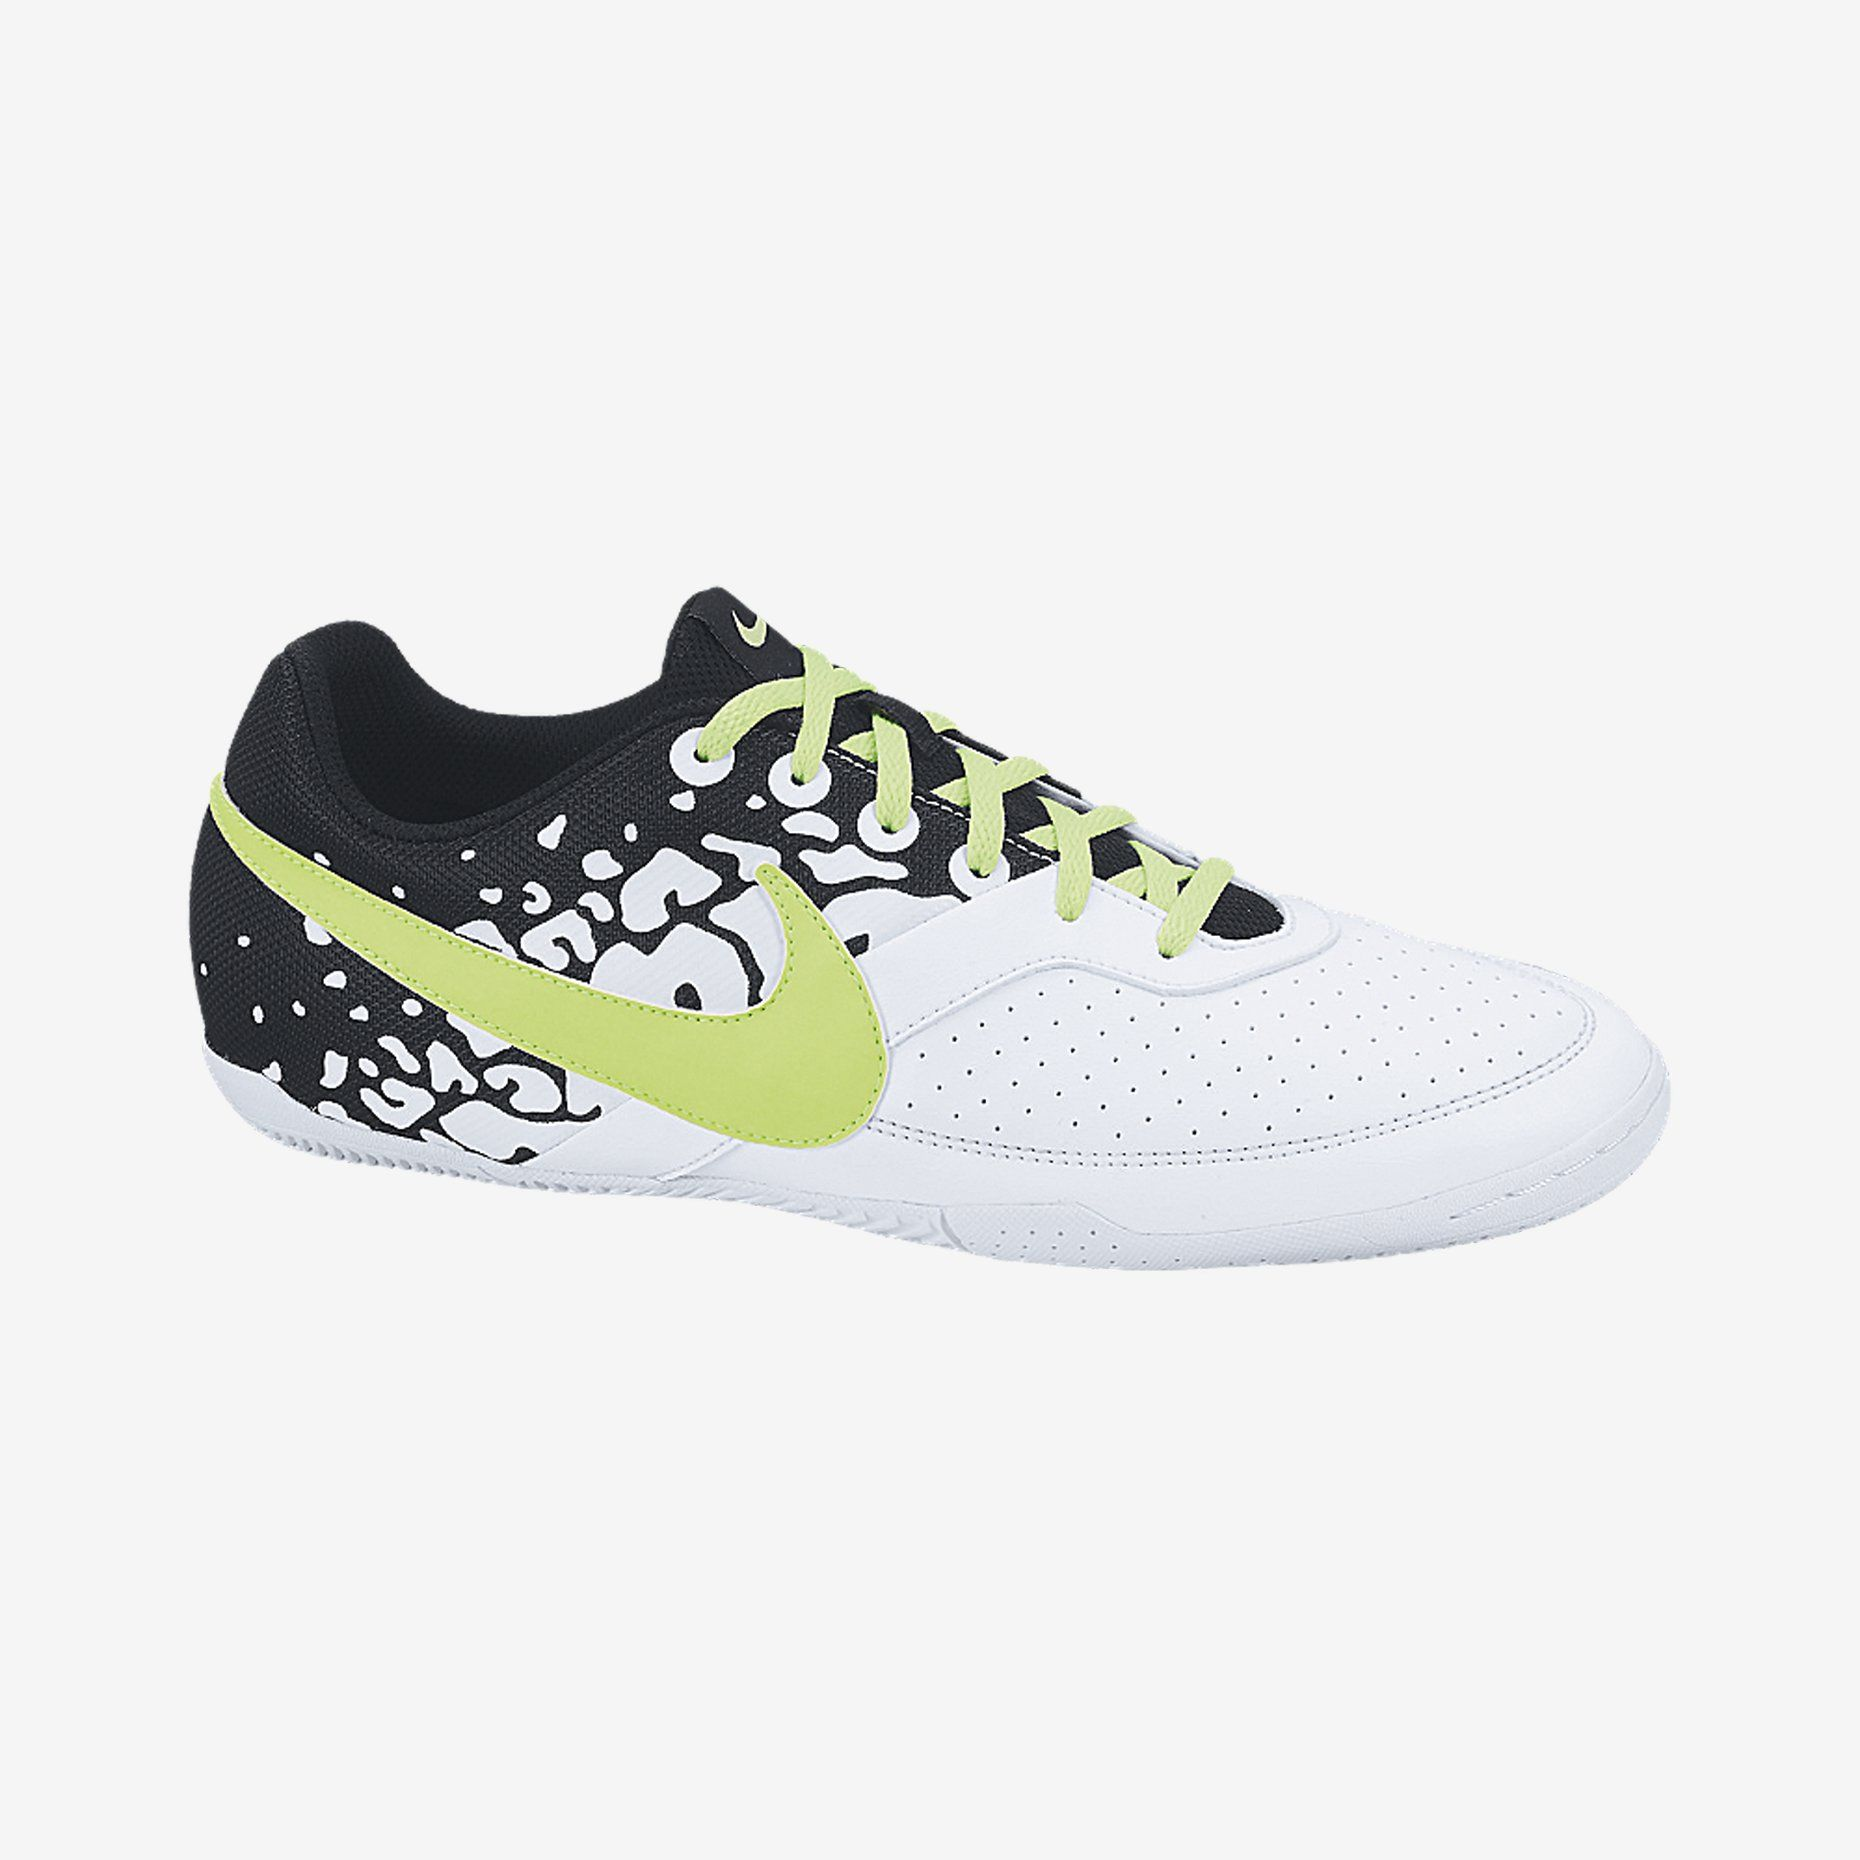 775d1ea4cc2 Nike Store. Nike5 Elastico II Men s Indoor-Competition Soccer Shoe ...